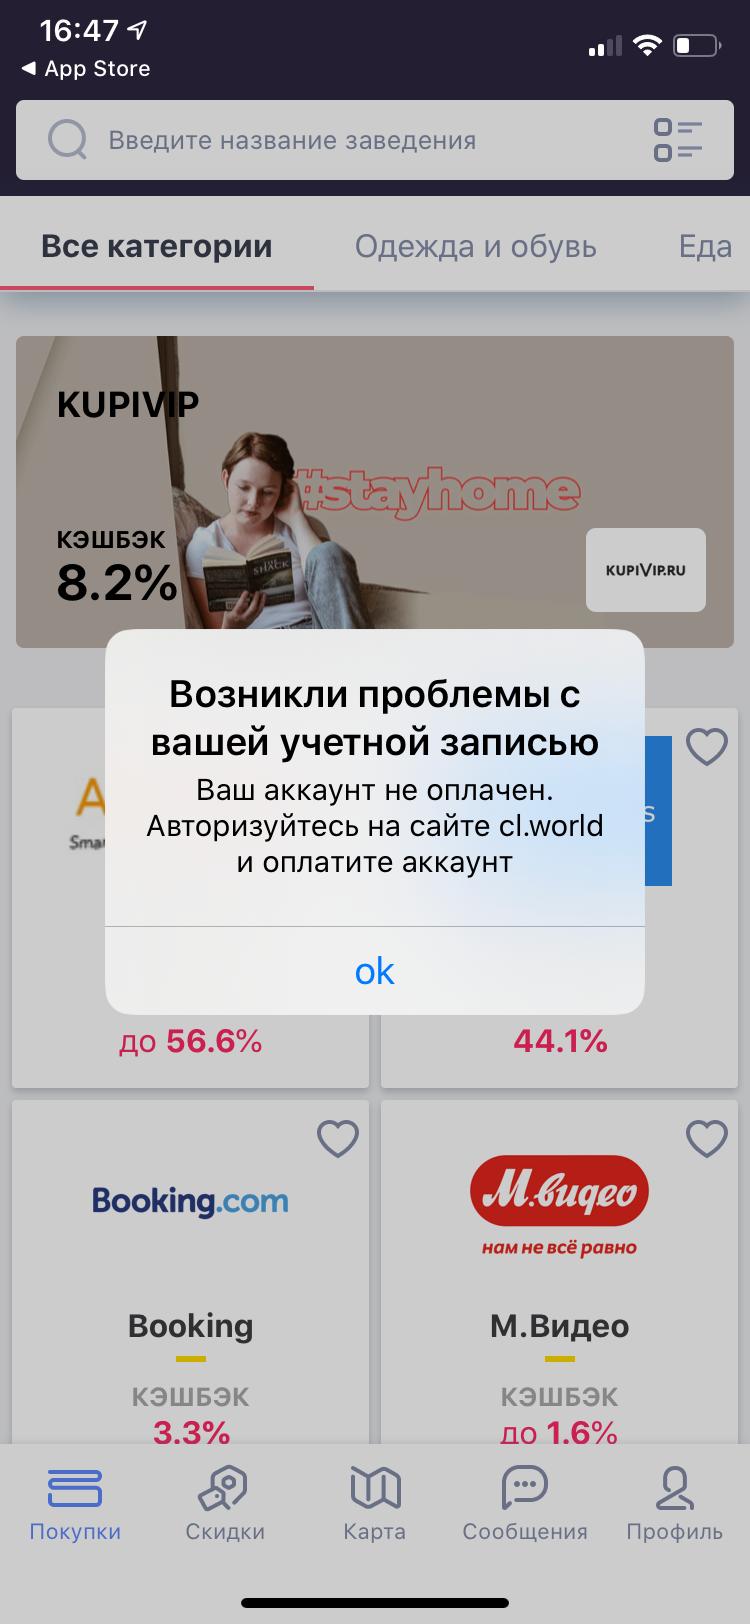 Без платного тарифа в приложение «Ситилайфа» не зайти